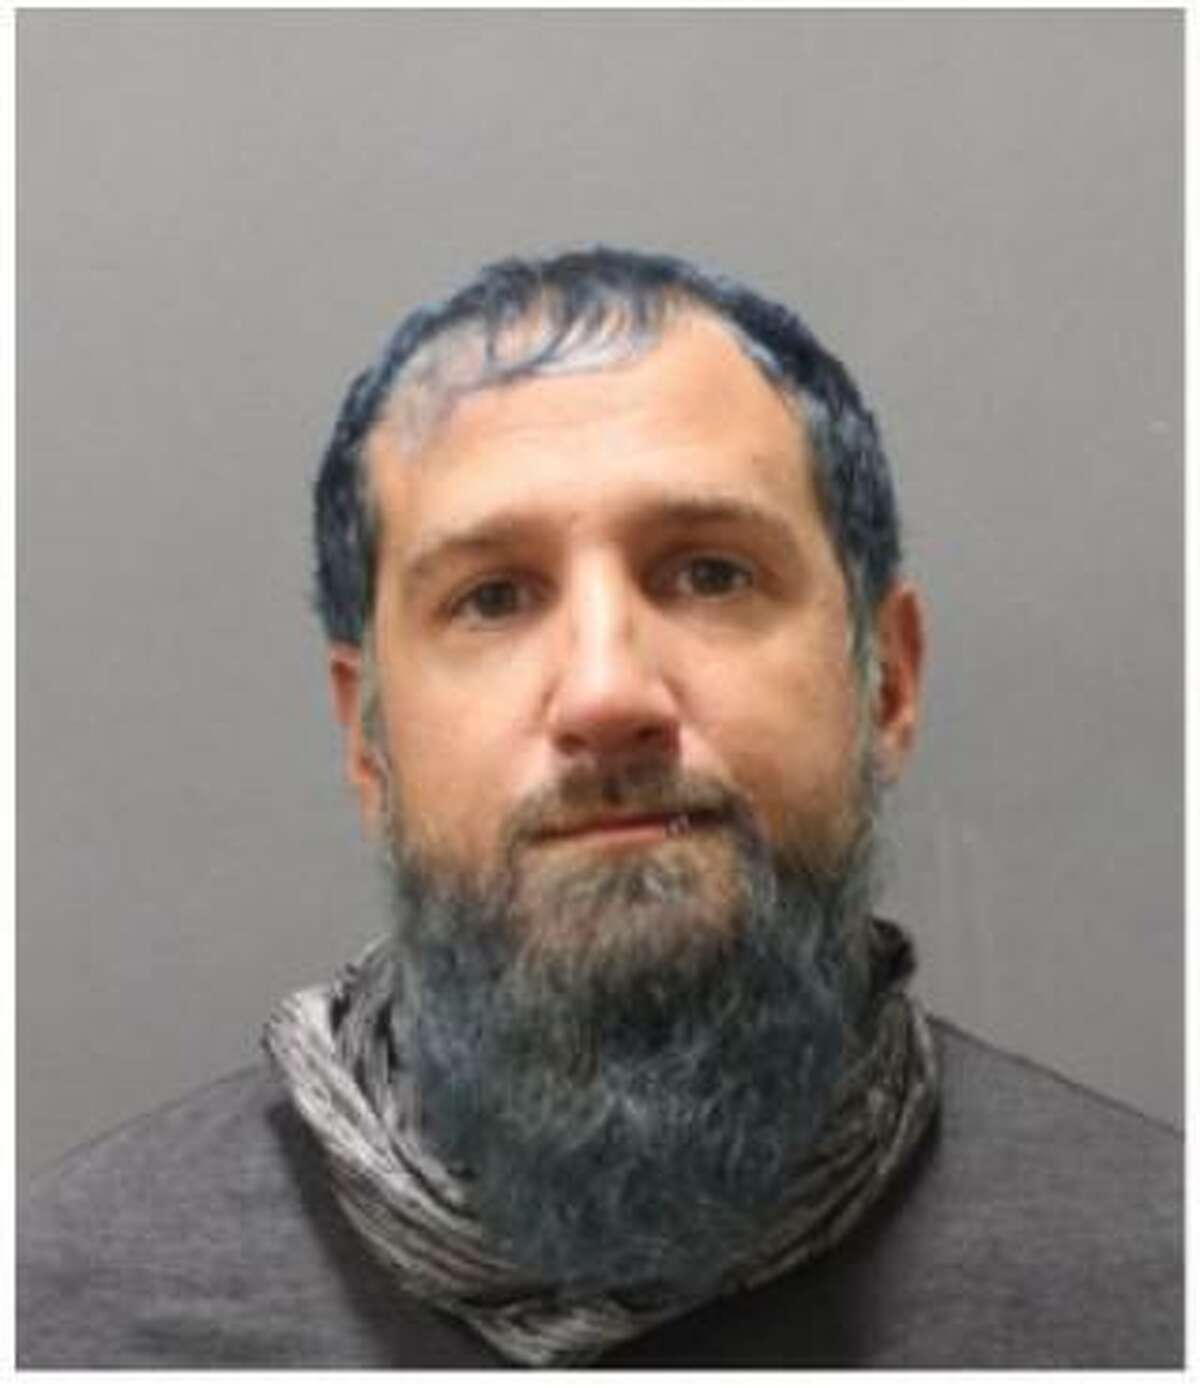 Michael Deane, 38, of Wauregan village in Plainfield